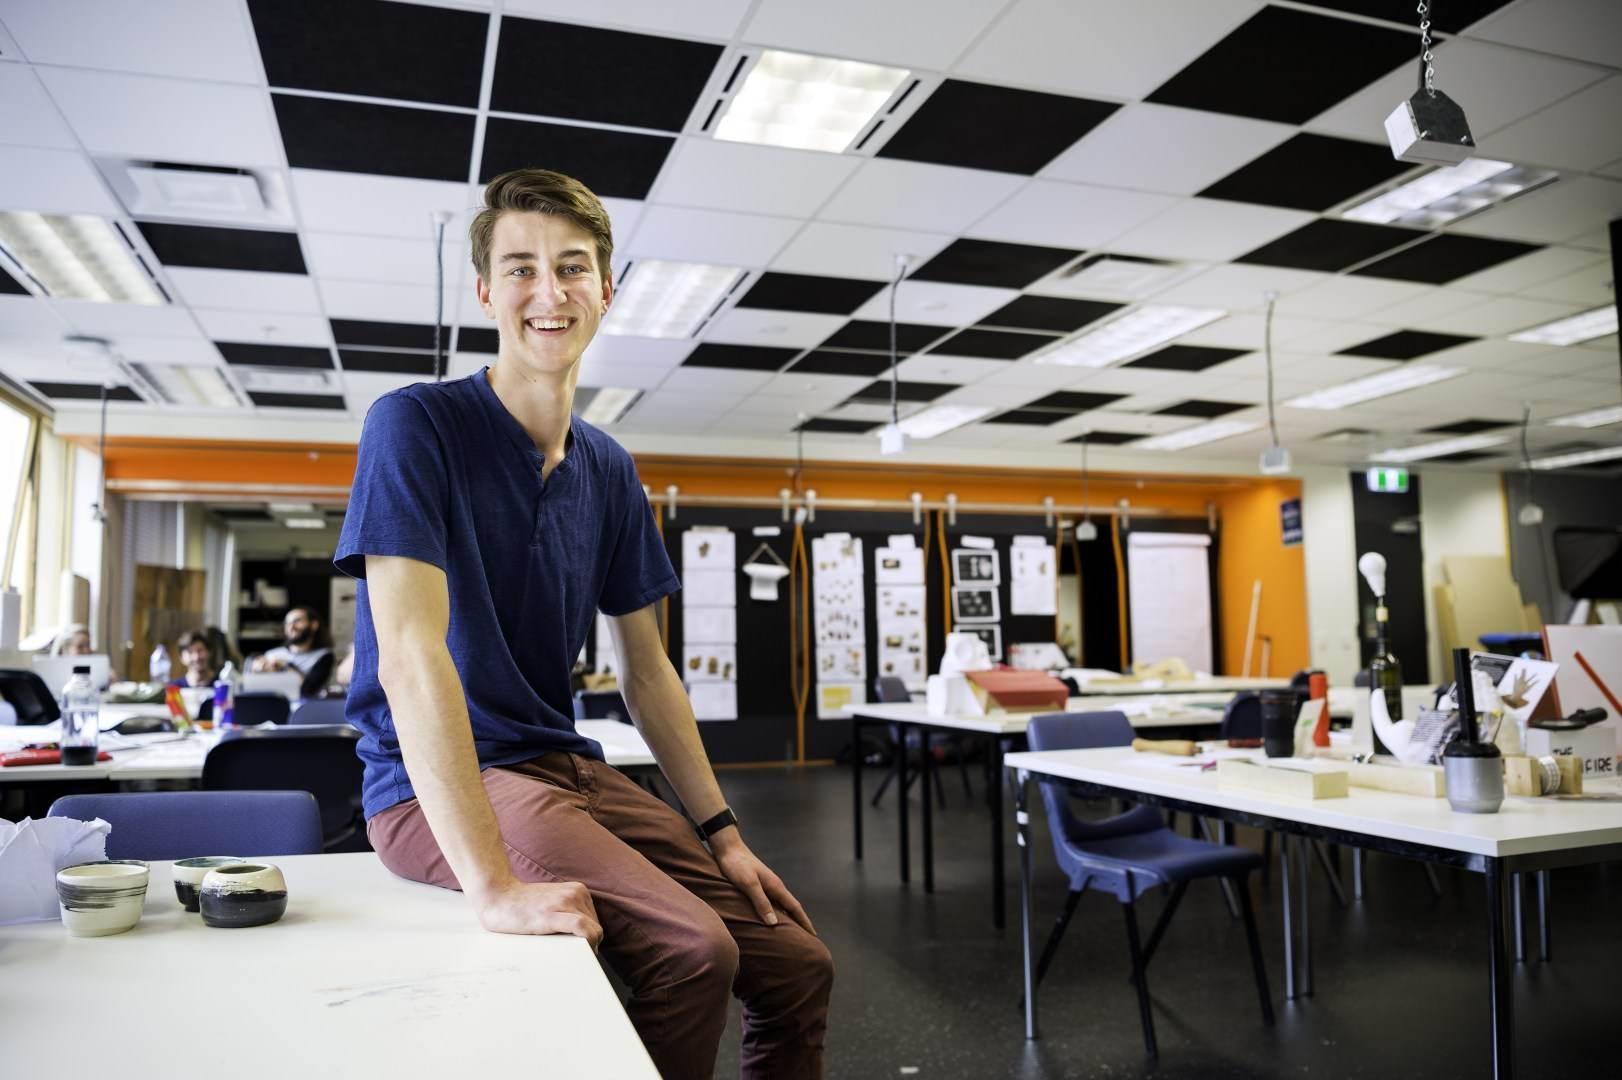 Study Design At The University Of South Australia